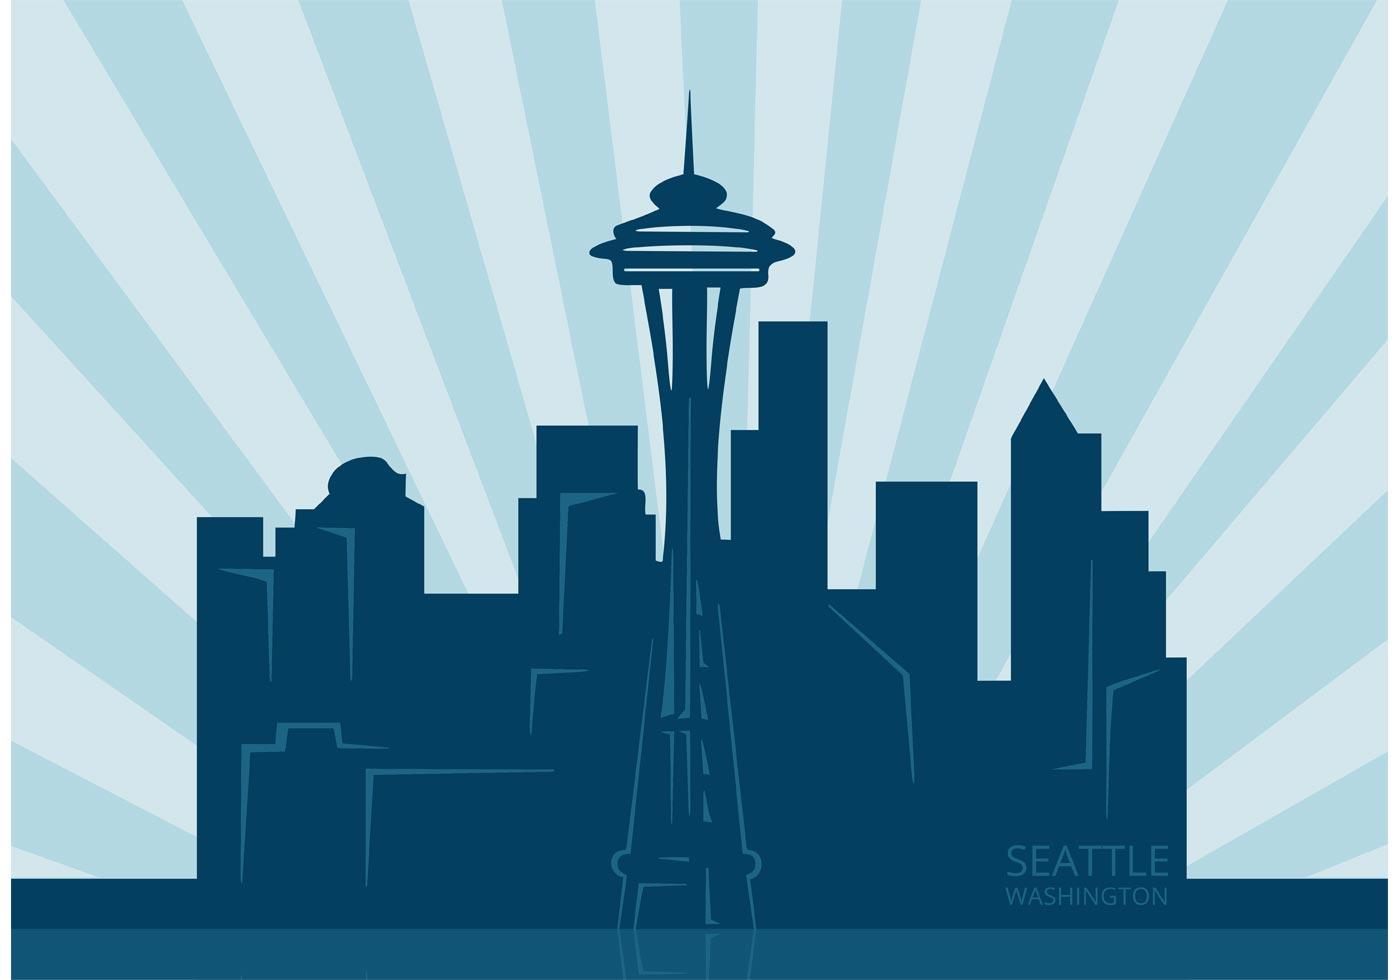 free vector seattle city skyline download free vector Seattle Rainier Skyline Silhouette Seattle Skyline Stencil